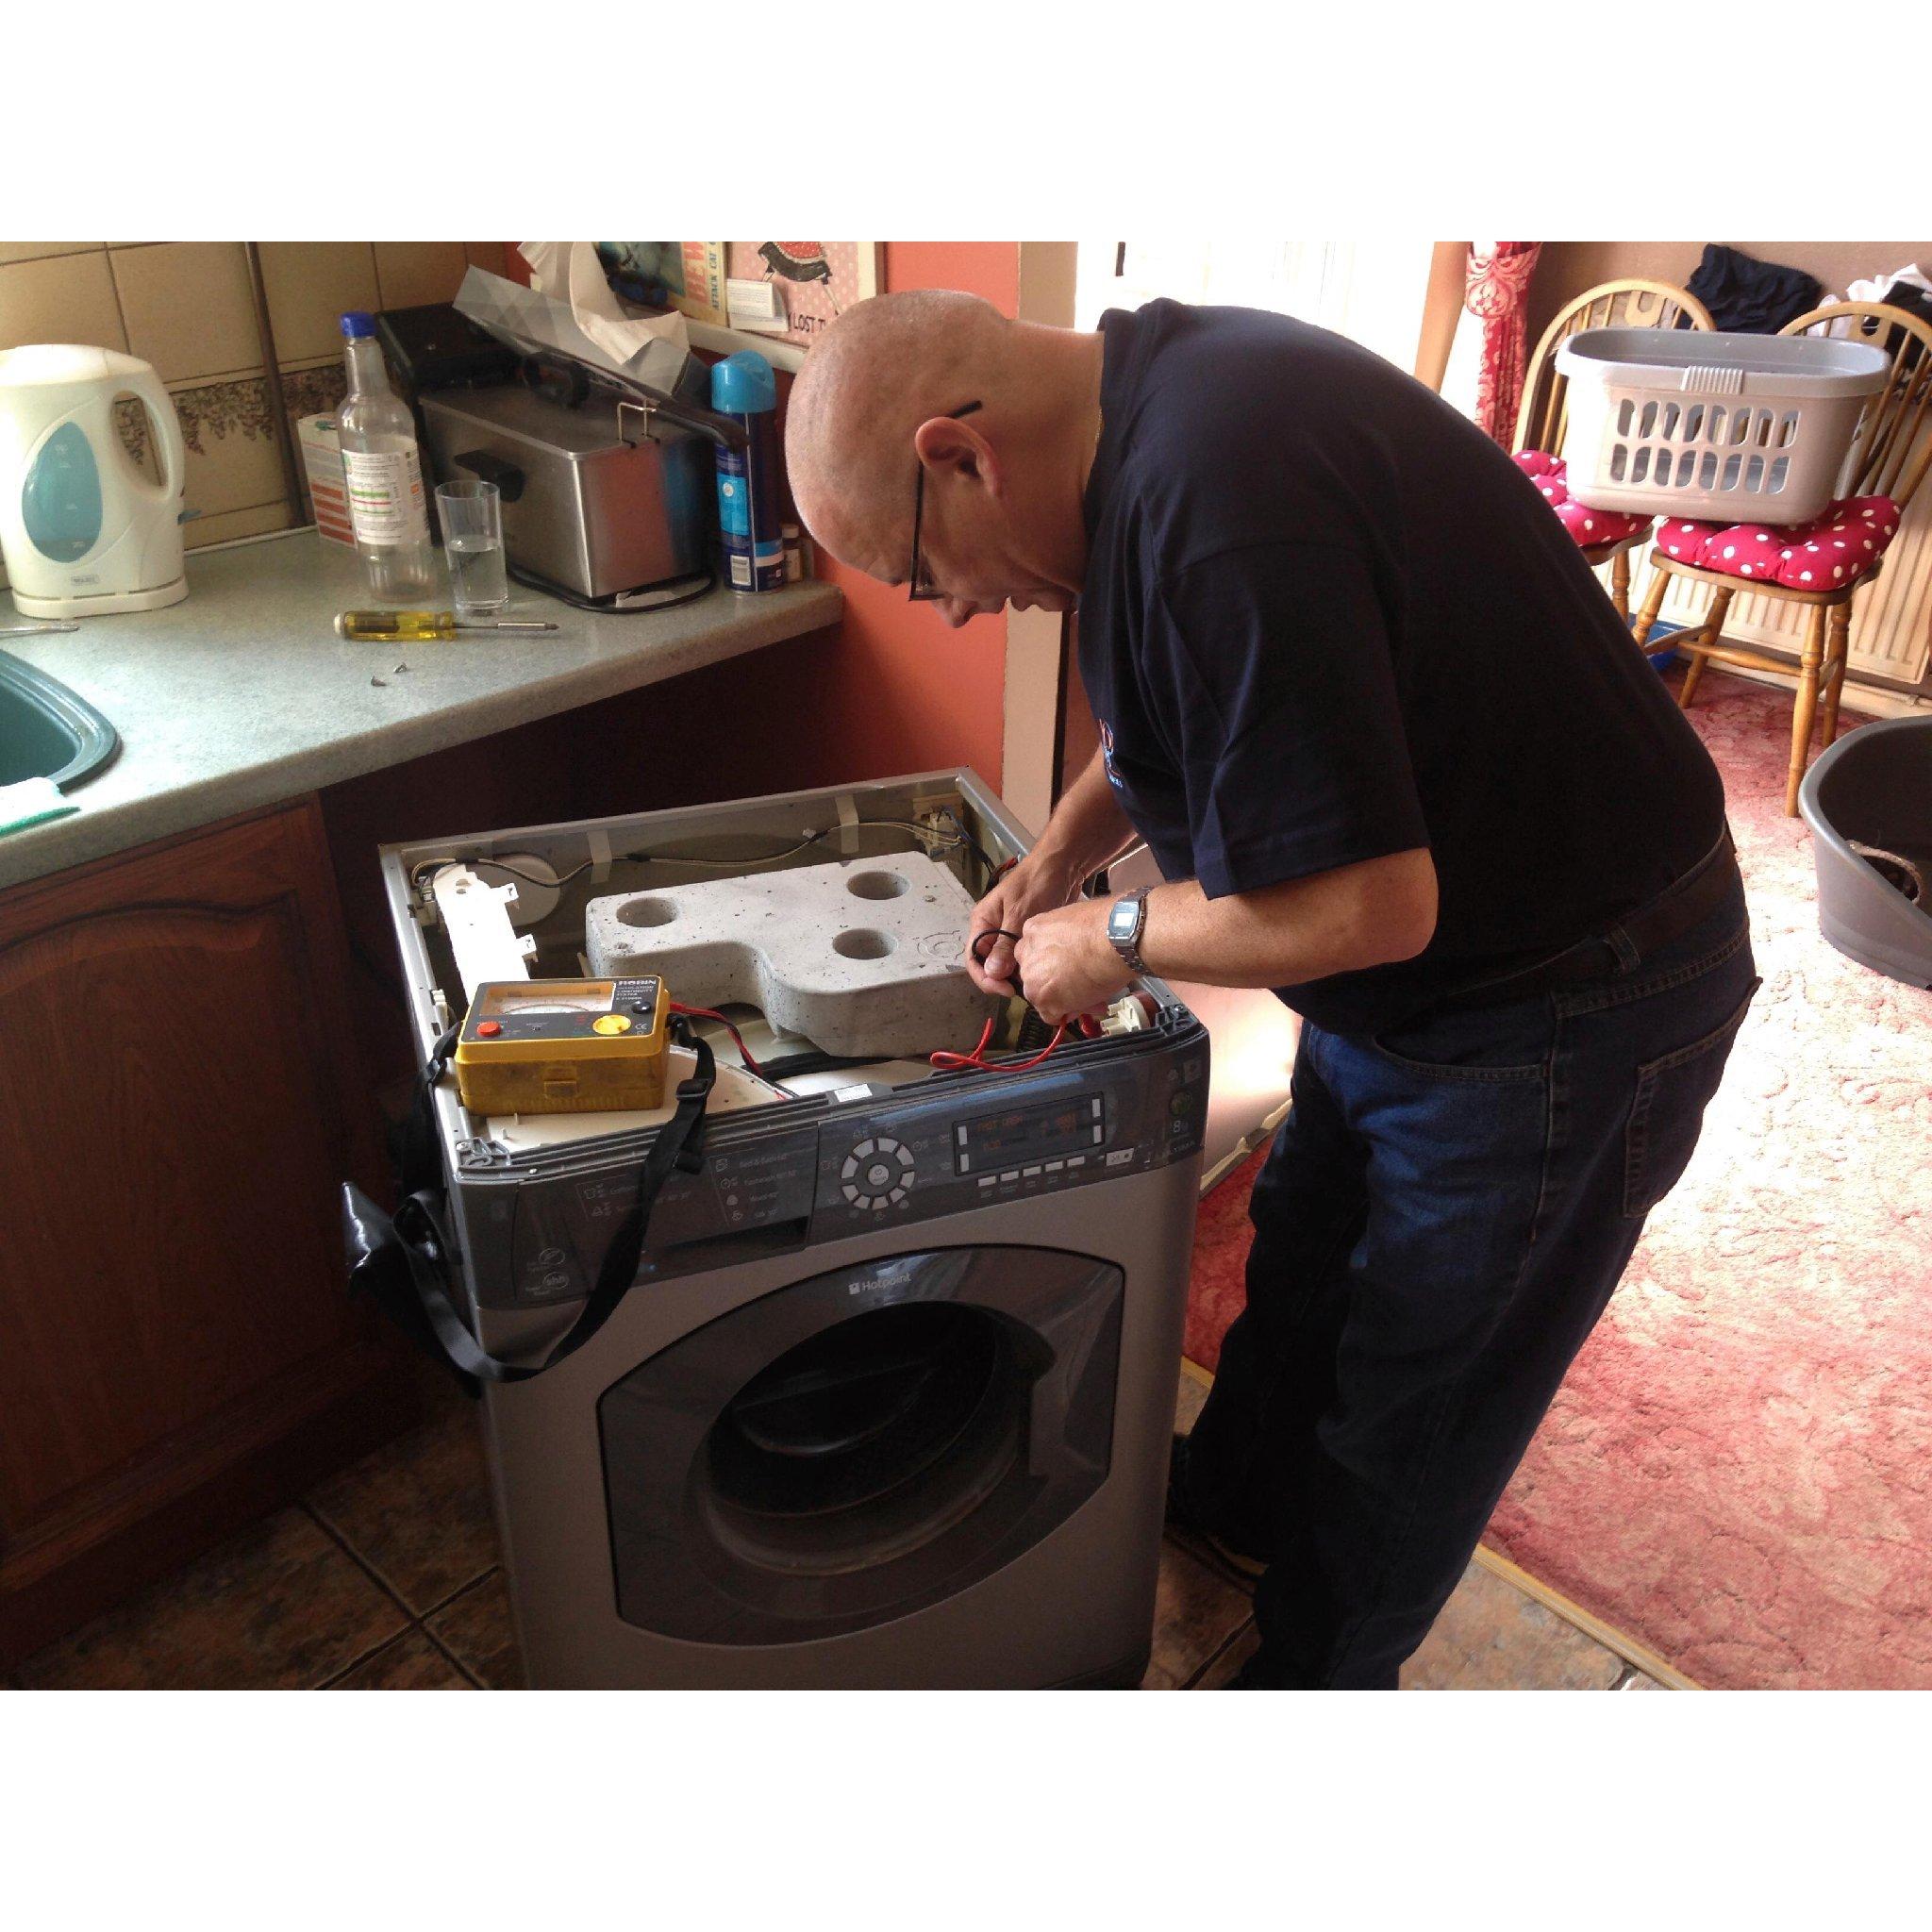 Paul Carter Domestic Appliances - Lincoln, Lincolnshire LN5 8SR - 01522 512771 | ShowMeLocal.com